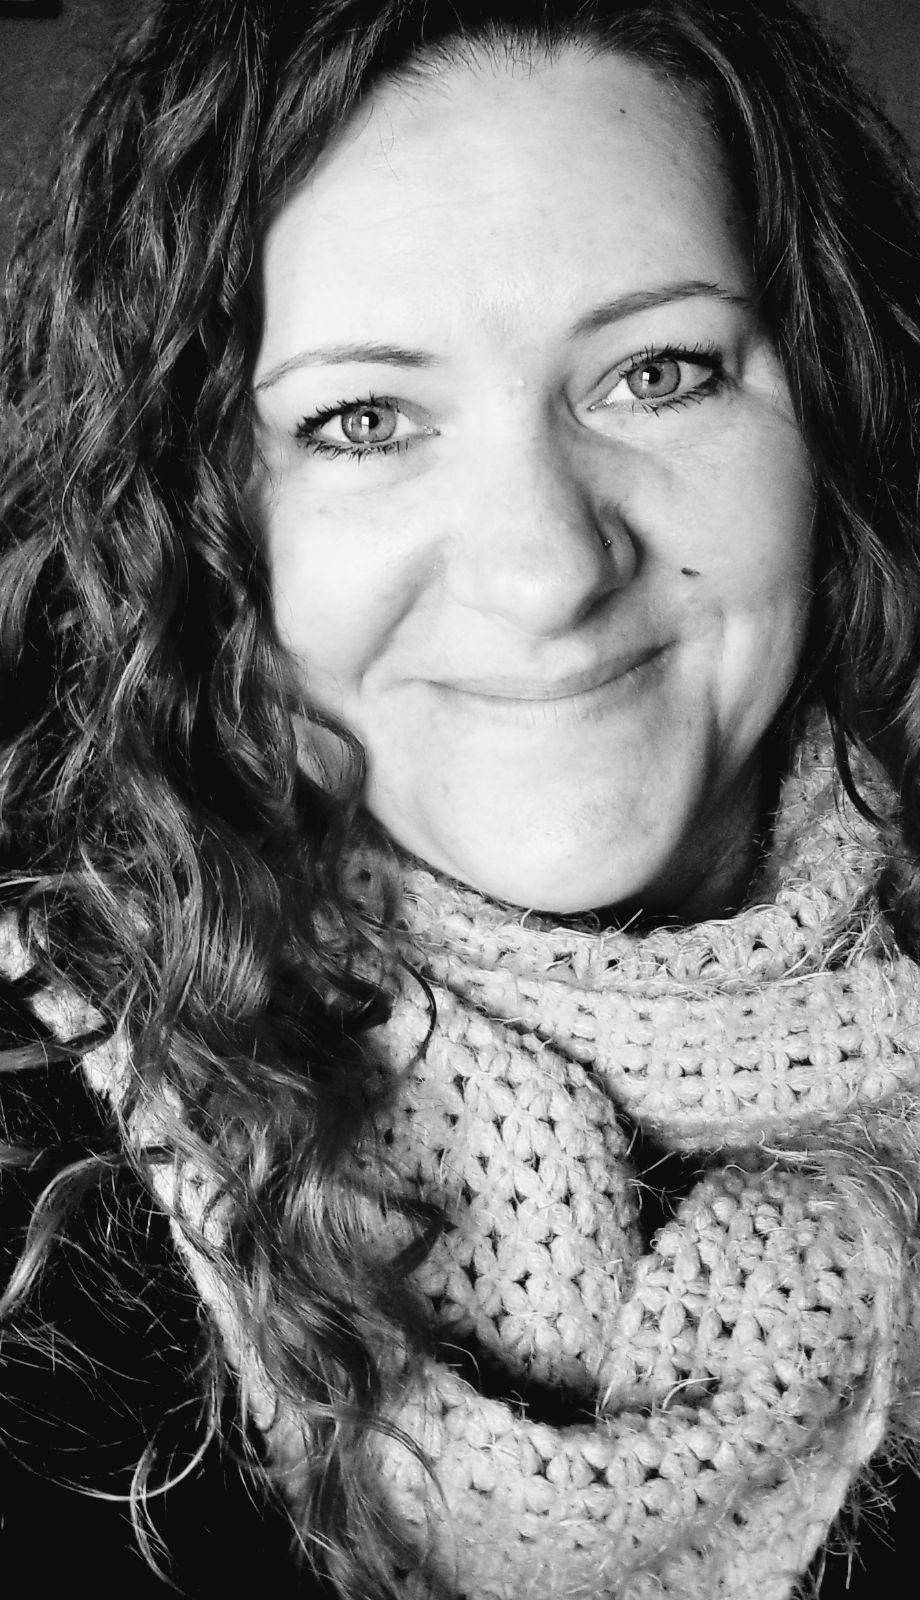 (Re)Introducing Robyn Milos…